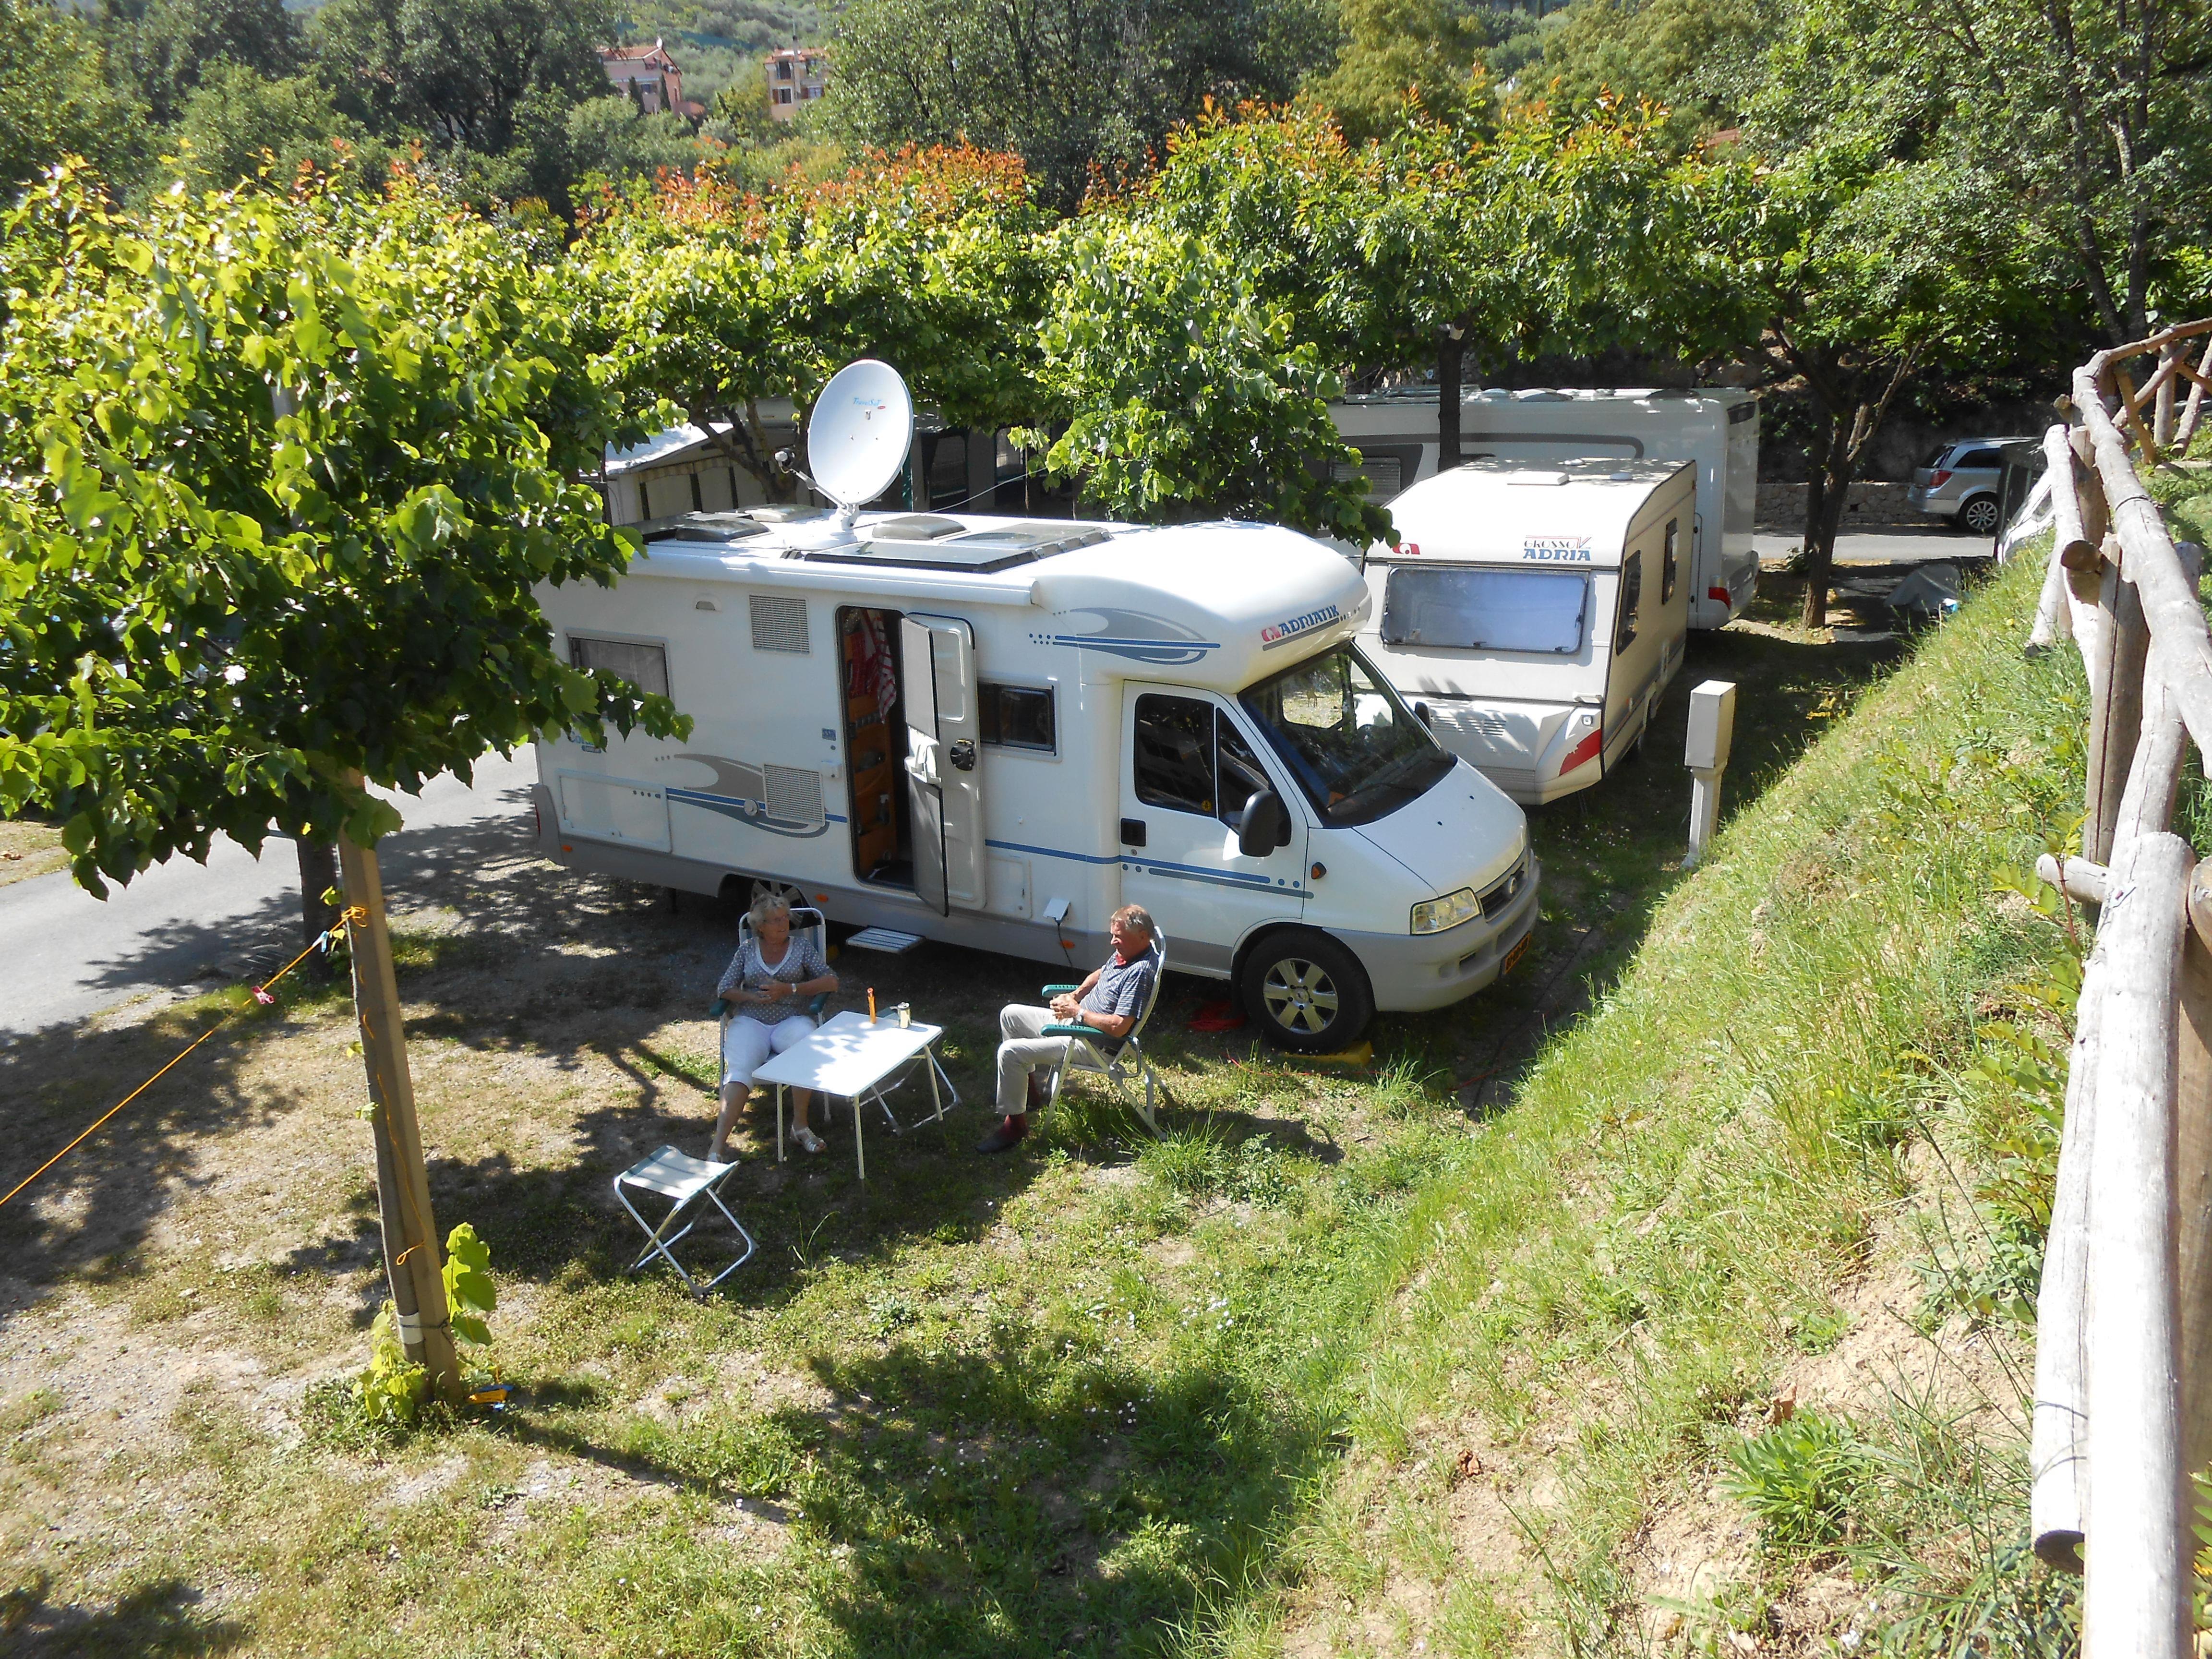 Emplacement - Emplacement : Caravane Max M. 7,30   Ou Camping-Car - Camping Pian dei Boschi